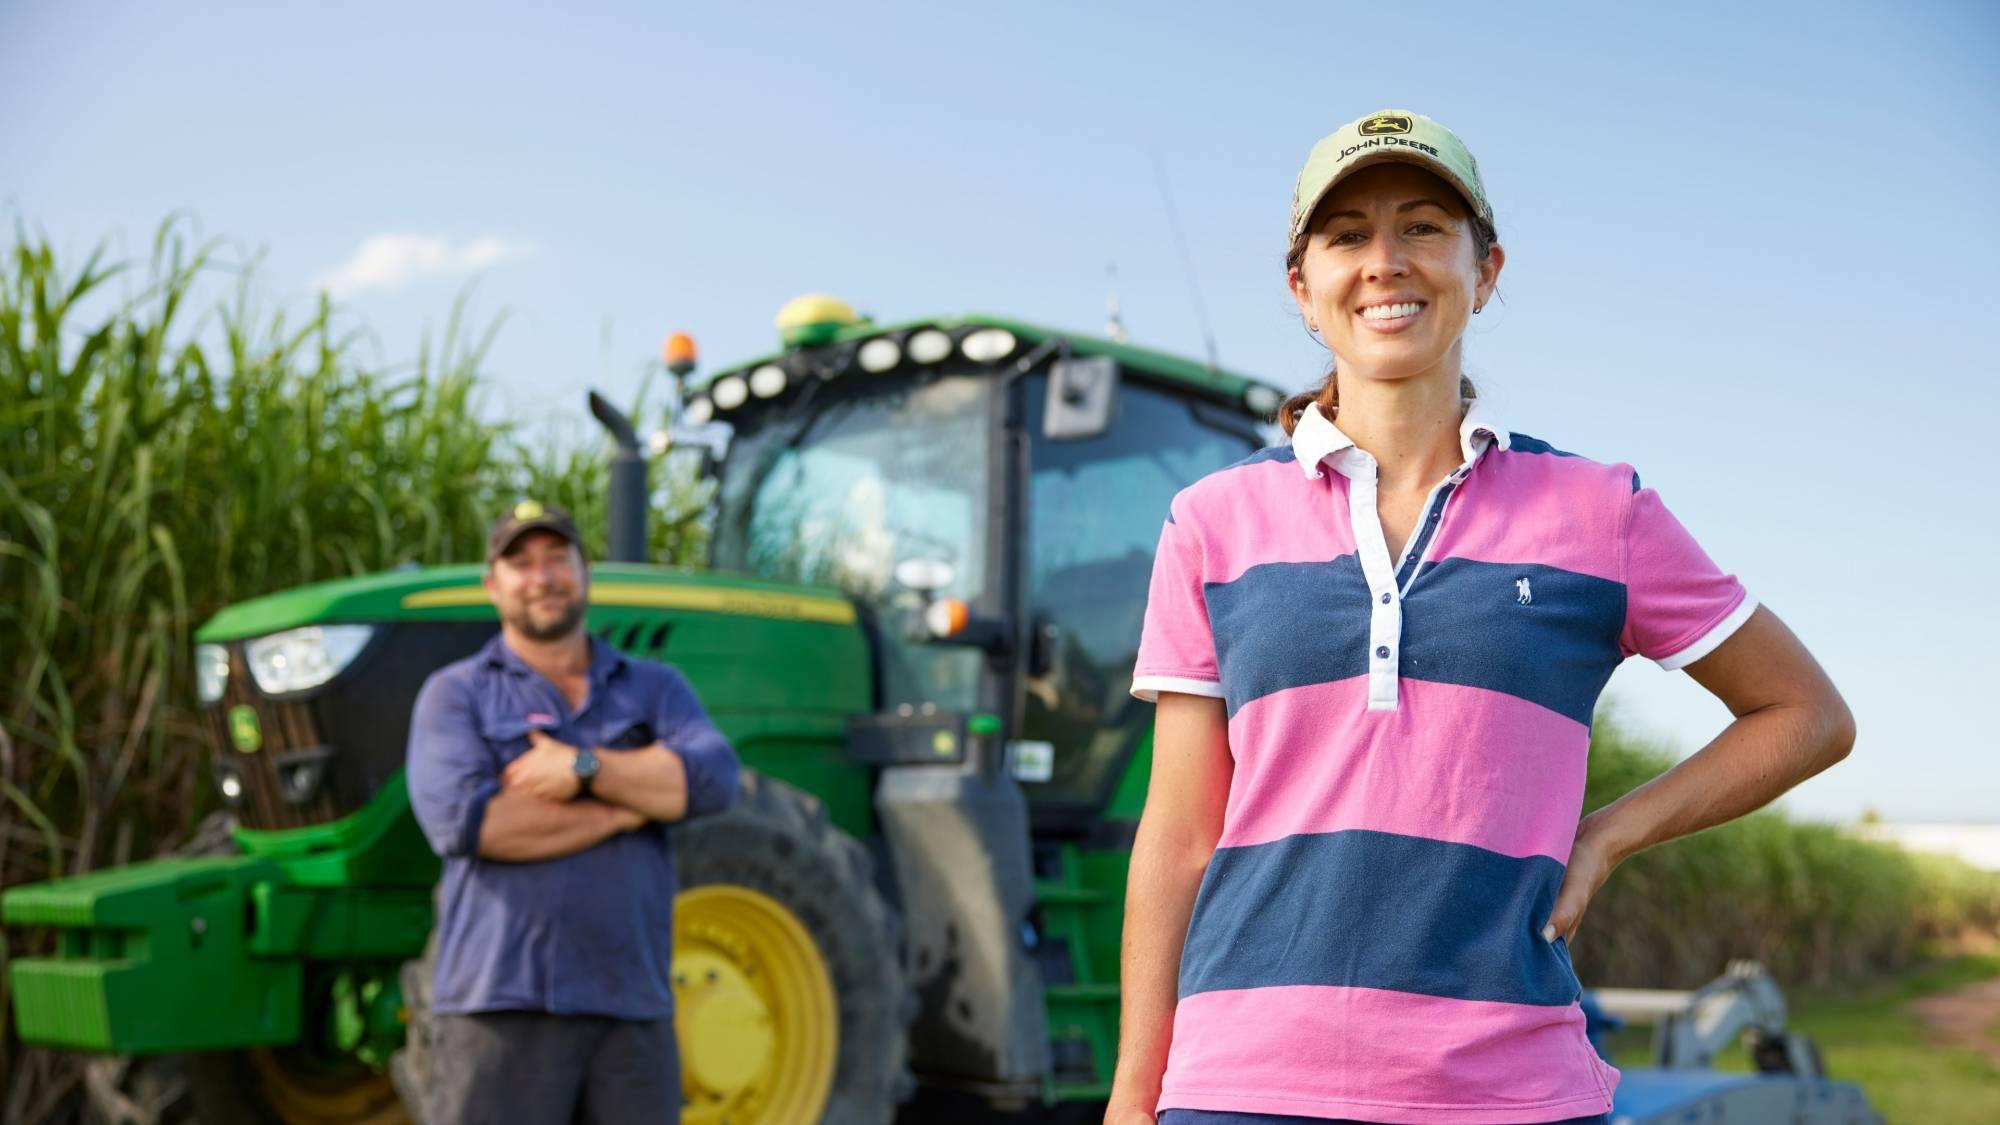 Local farming business - financial services brand Cosca